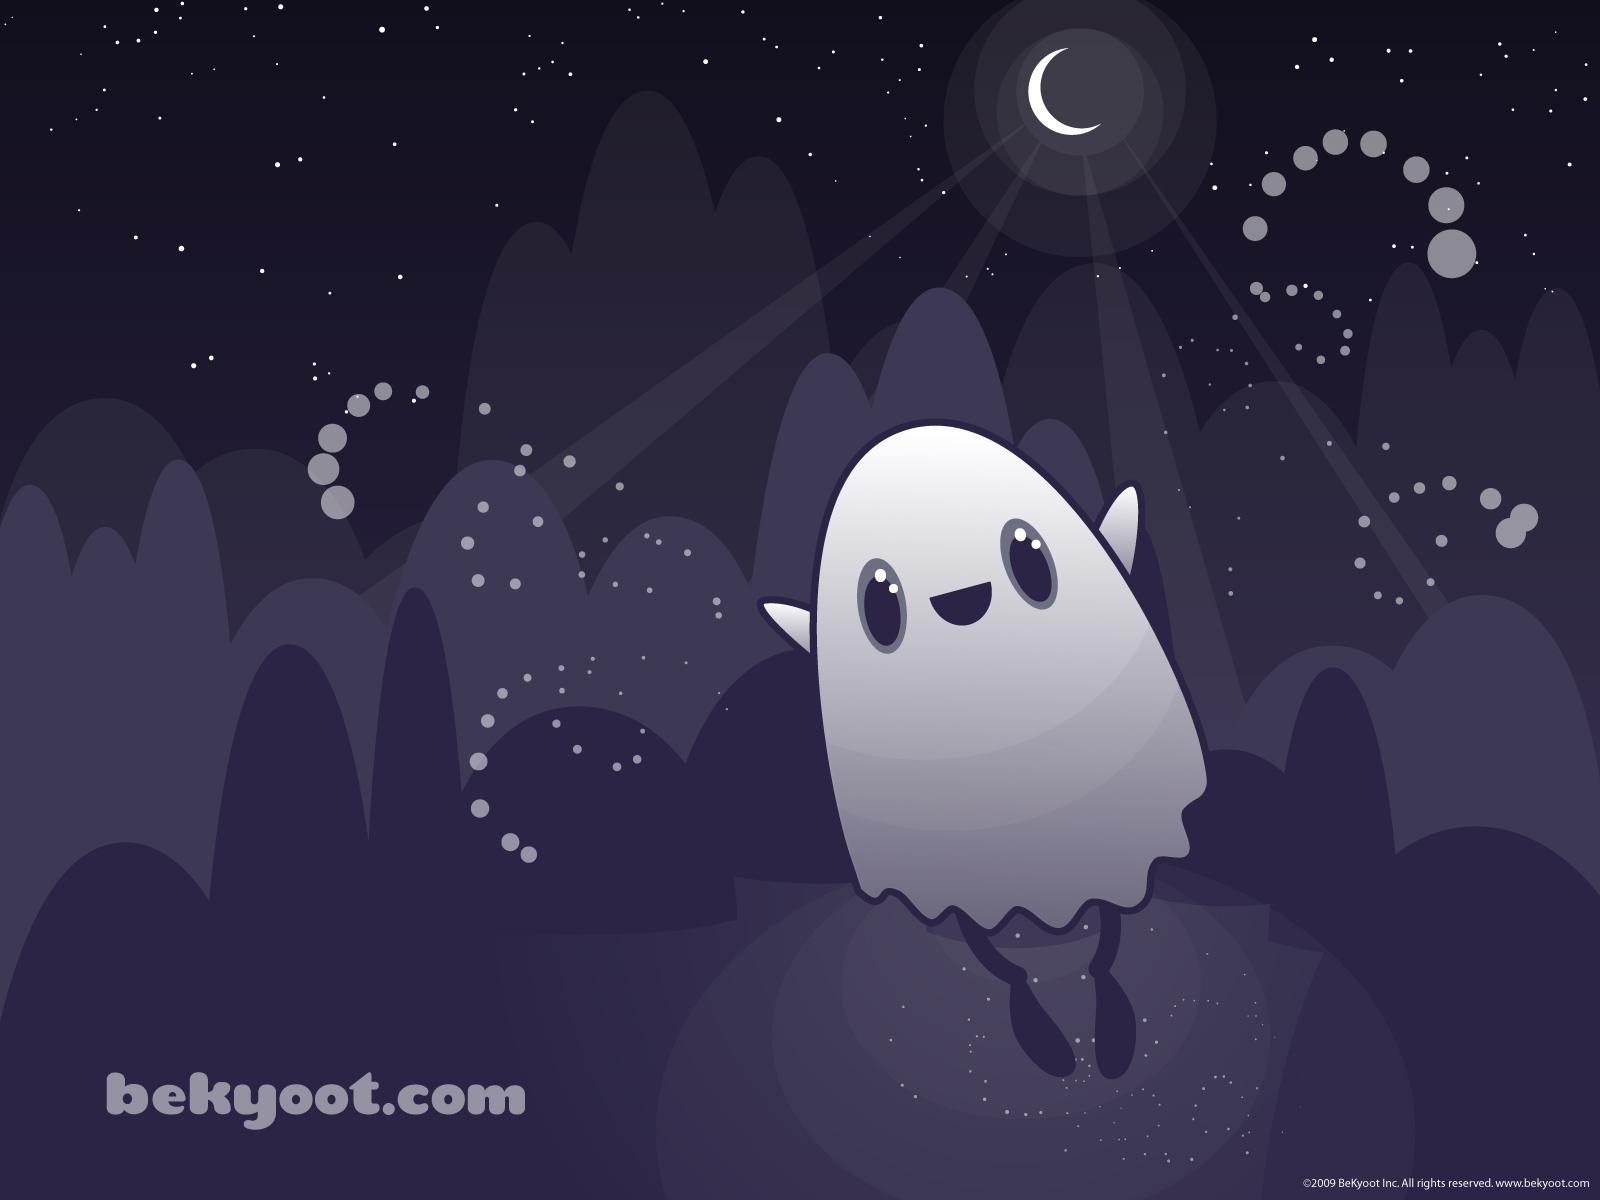 Cute Ghost Wallpaper Bu the ghosts night flight 1600x1200